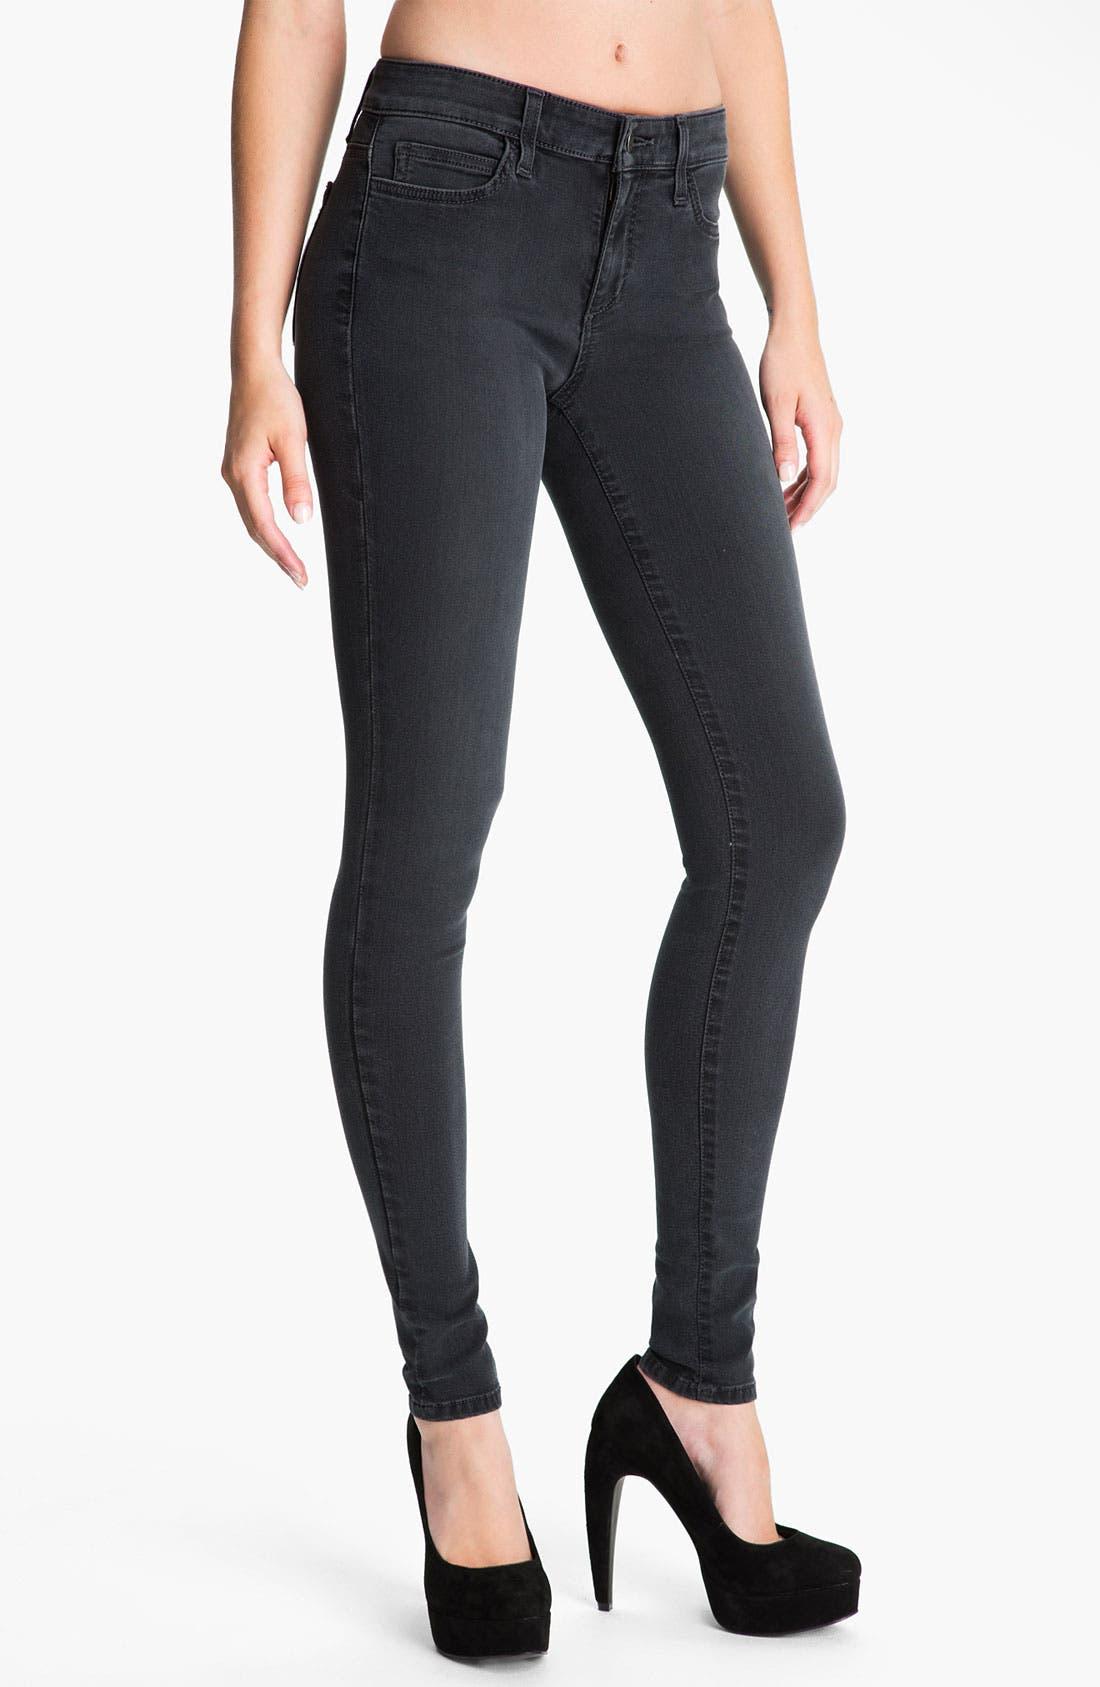 Alternate Image 1 Selected - Joe's Skinny Stretch Jeans (Black)